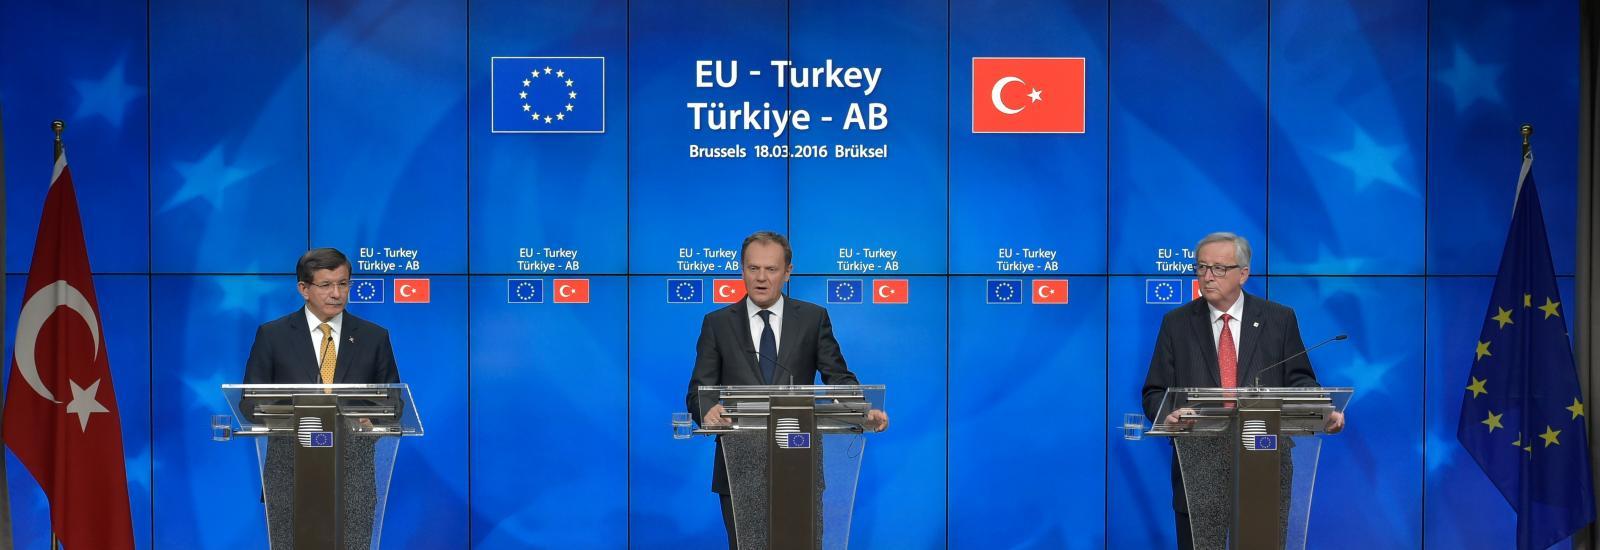 © Union européenne 2016